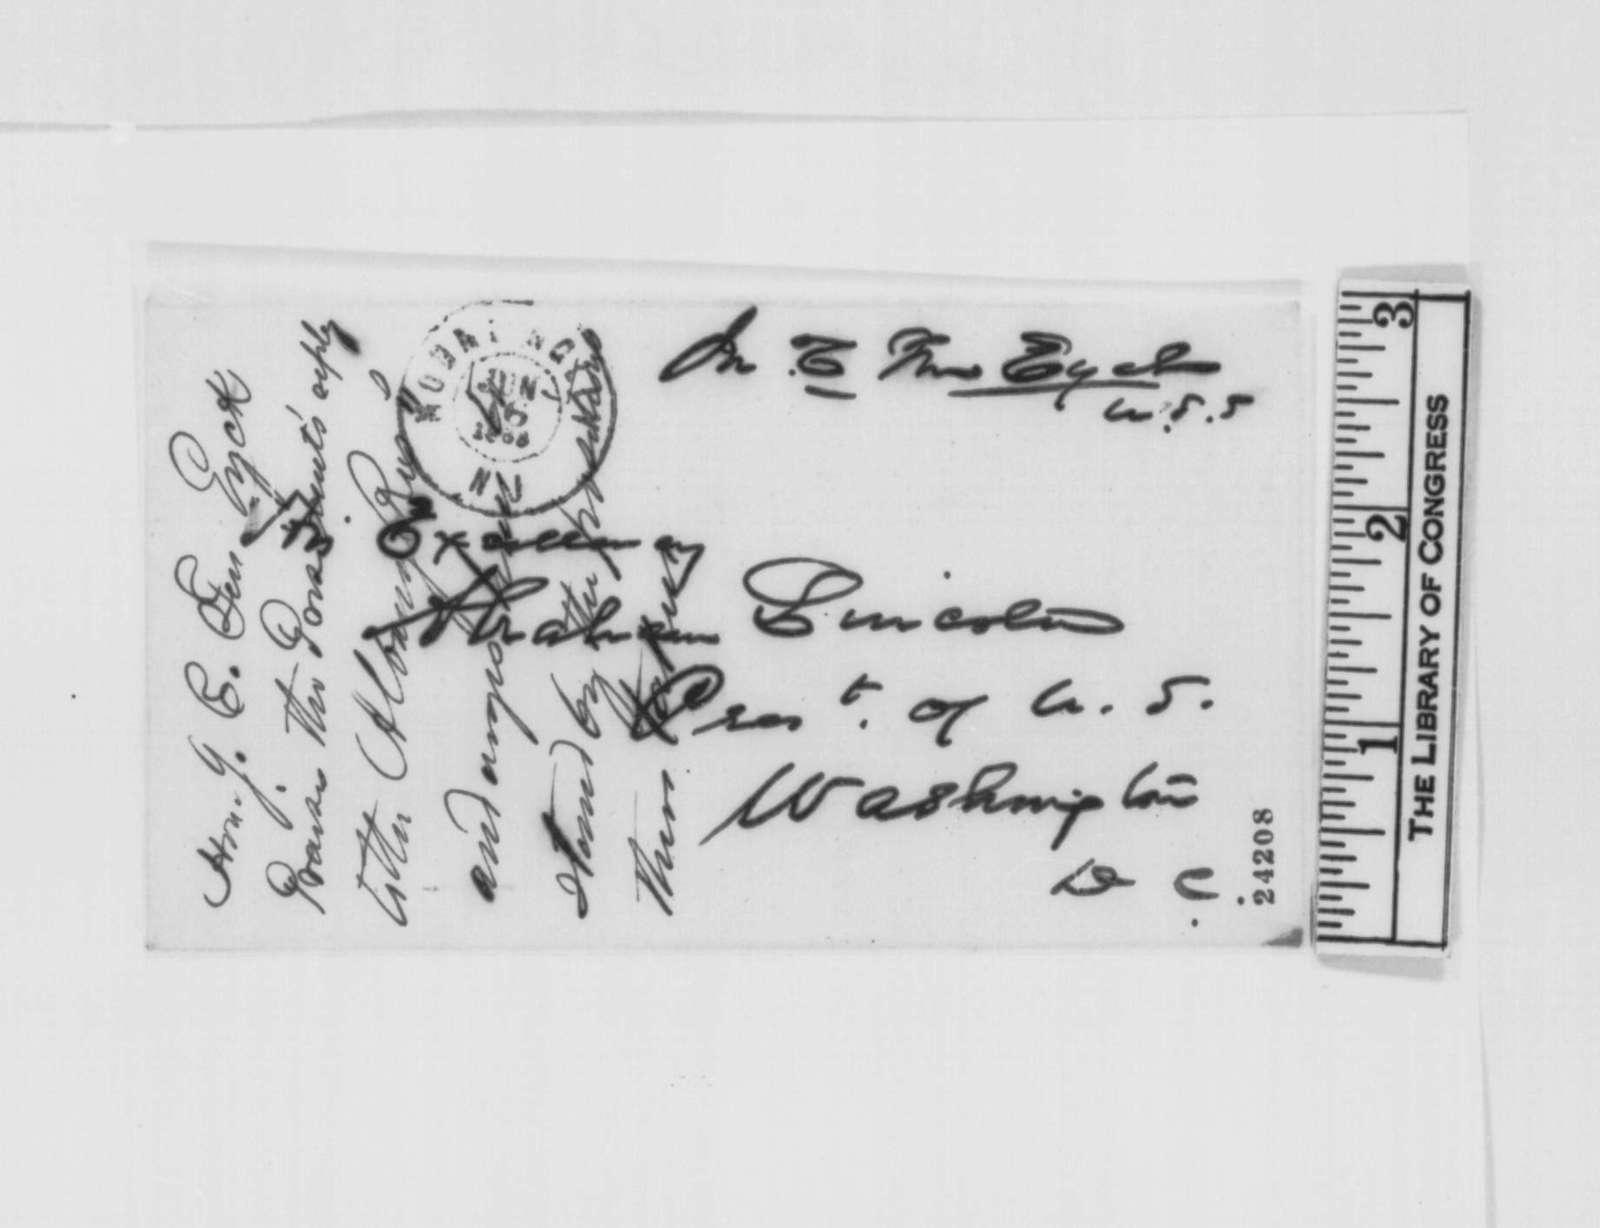 John C. Ten Eyck to Abraham Lincoln, Tuesday, June 16, 1863  (Praise for Lincoln's letter to Erastus Corning)